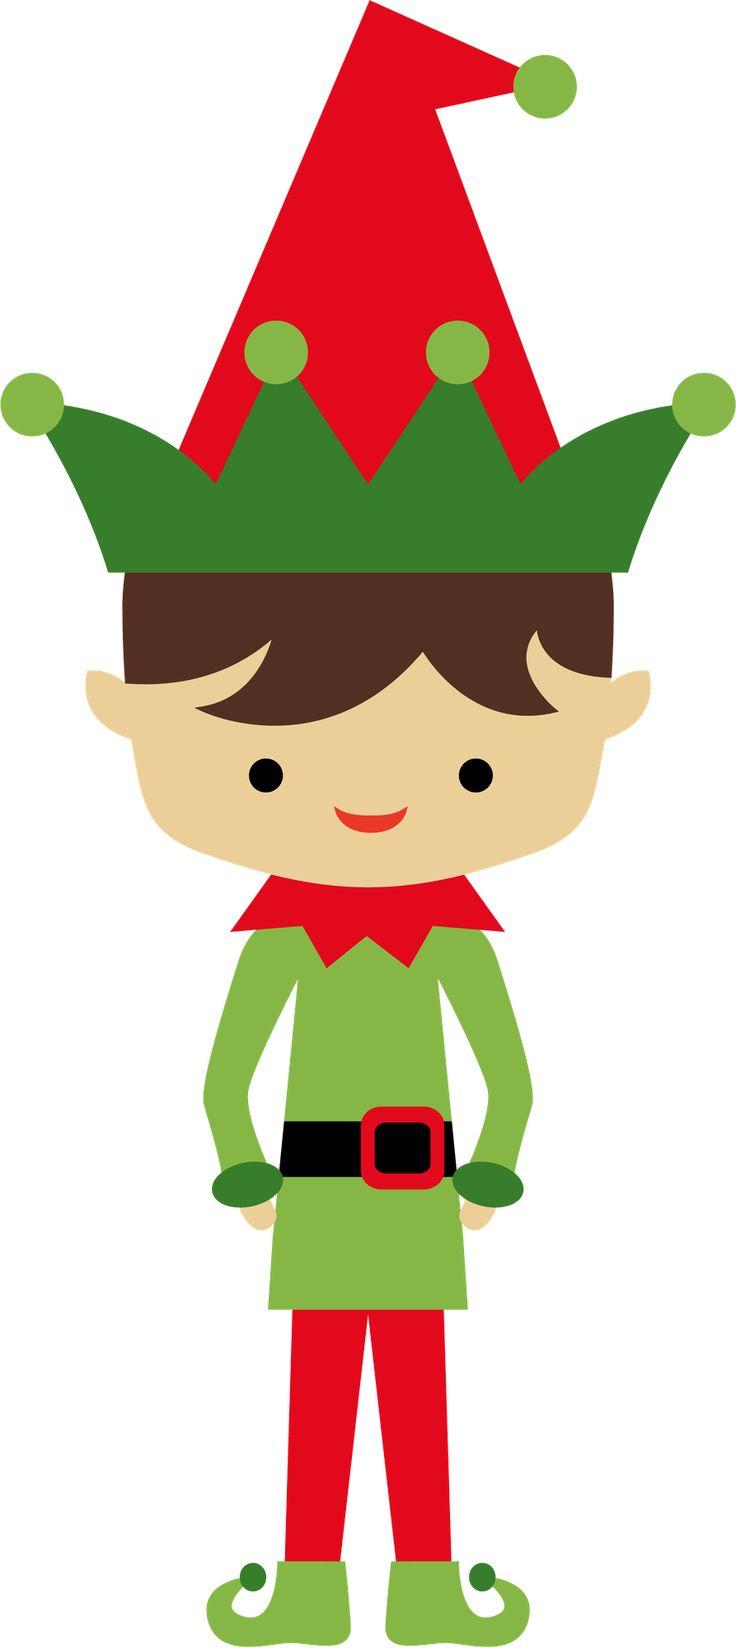 CHRISTMAS ELF LITTLE BOY CLIP ART-CHRISTMAS ELF LITTLE BOY CLIP ART-4